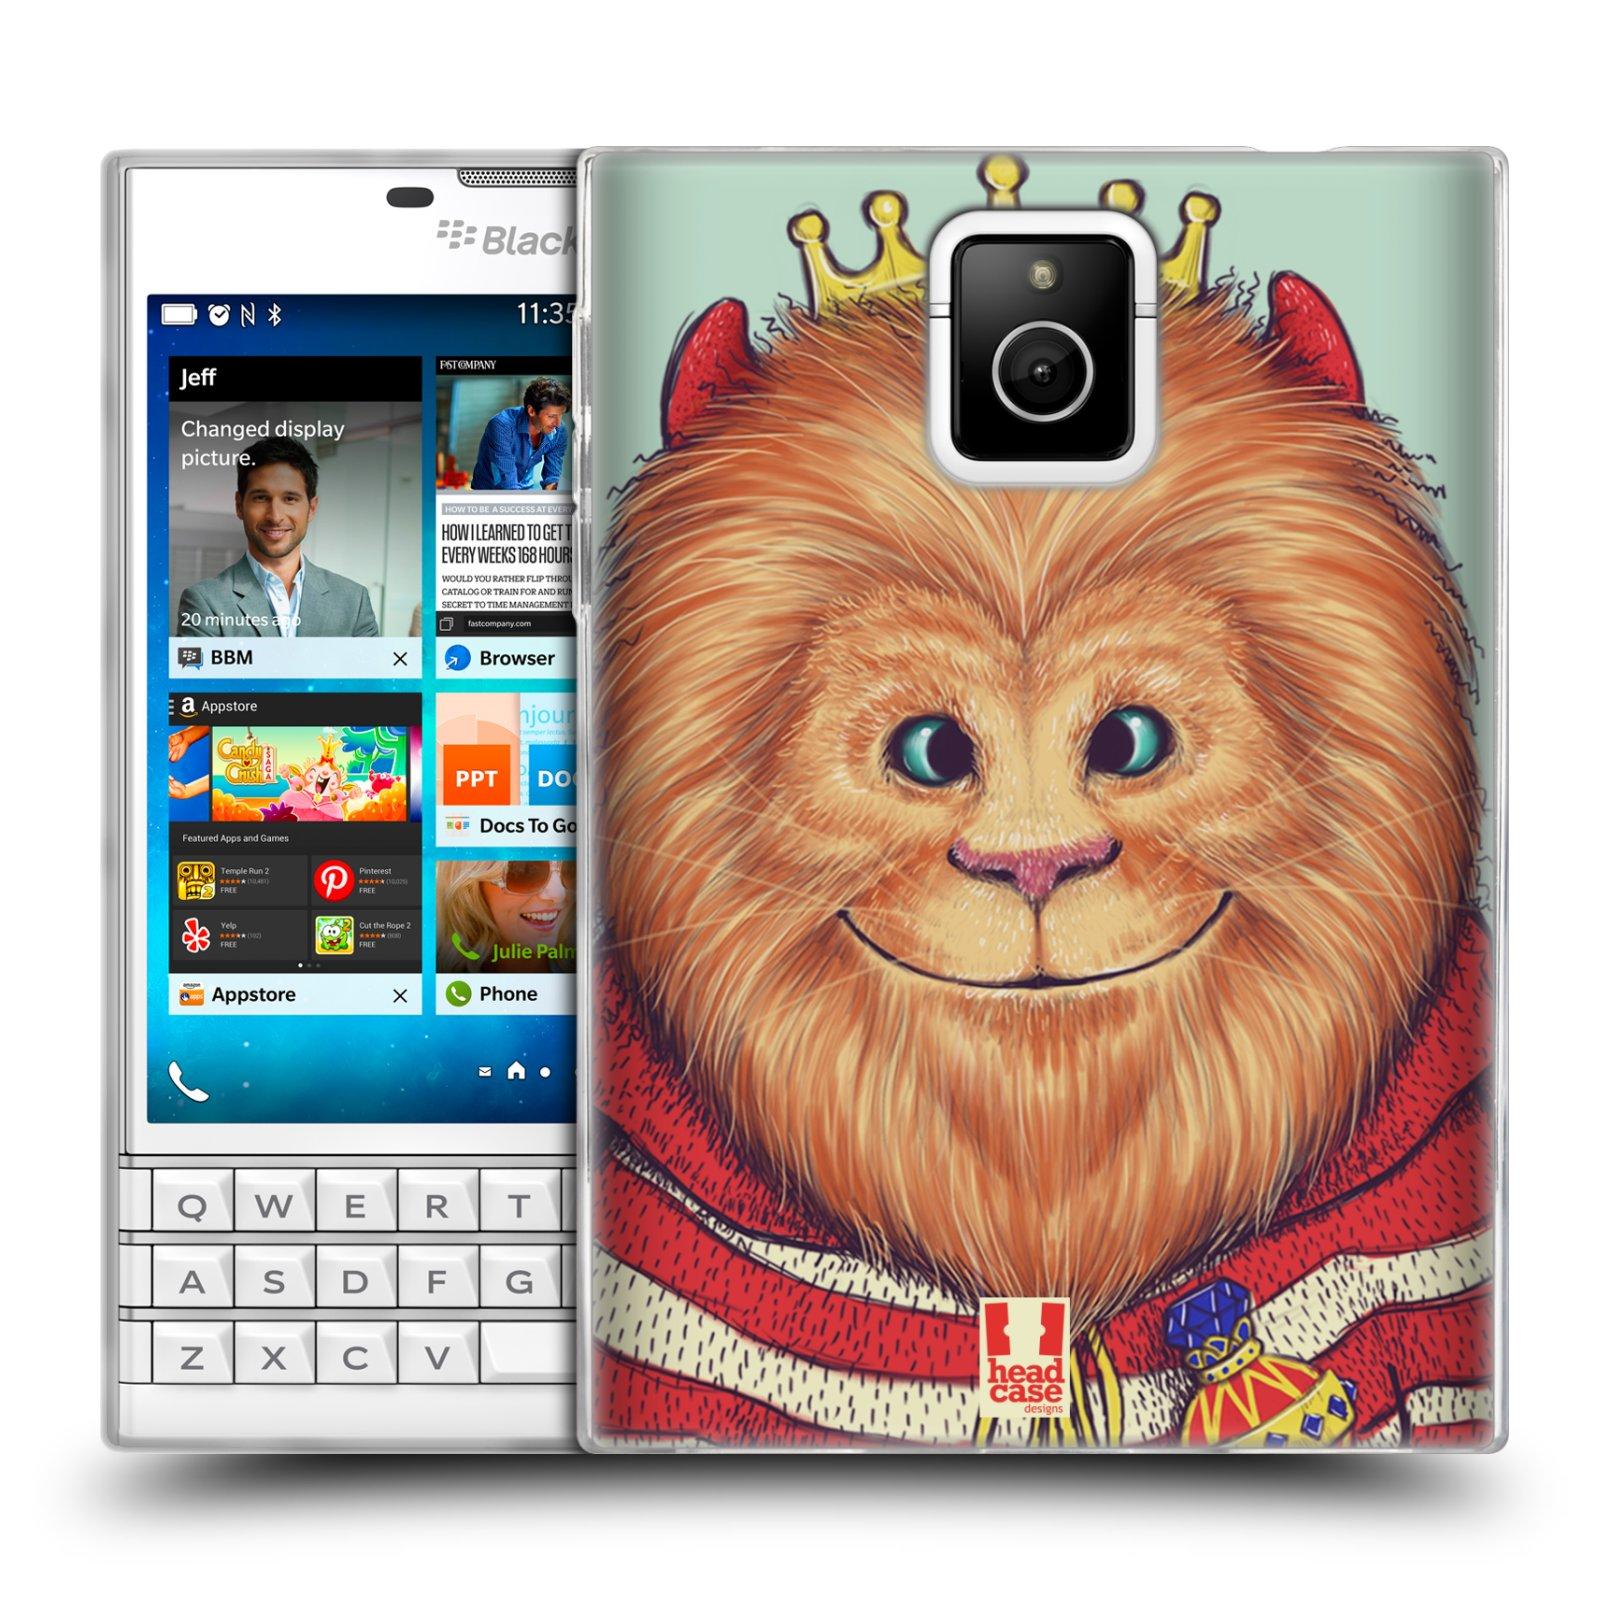 HEAD CASE silikonový obal na mobil Blackberry PASSPORT vzor Kreslená zvířátka lev